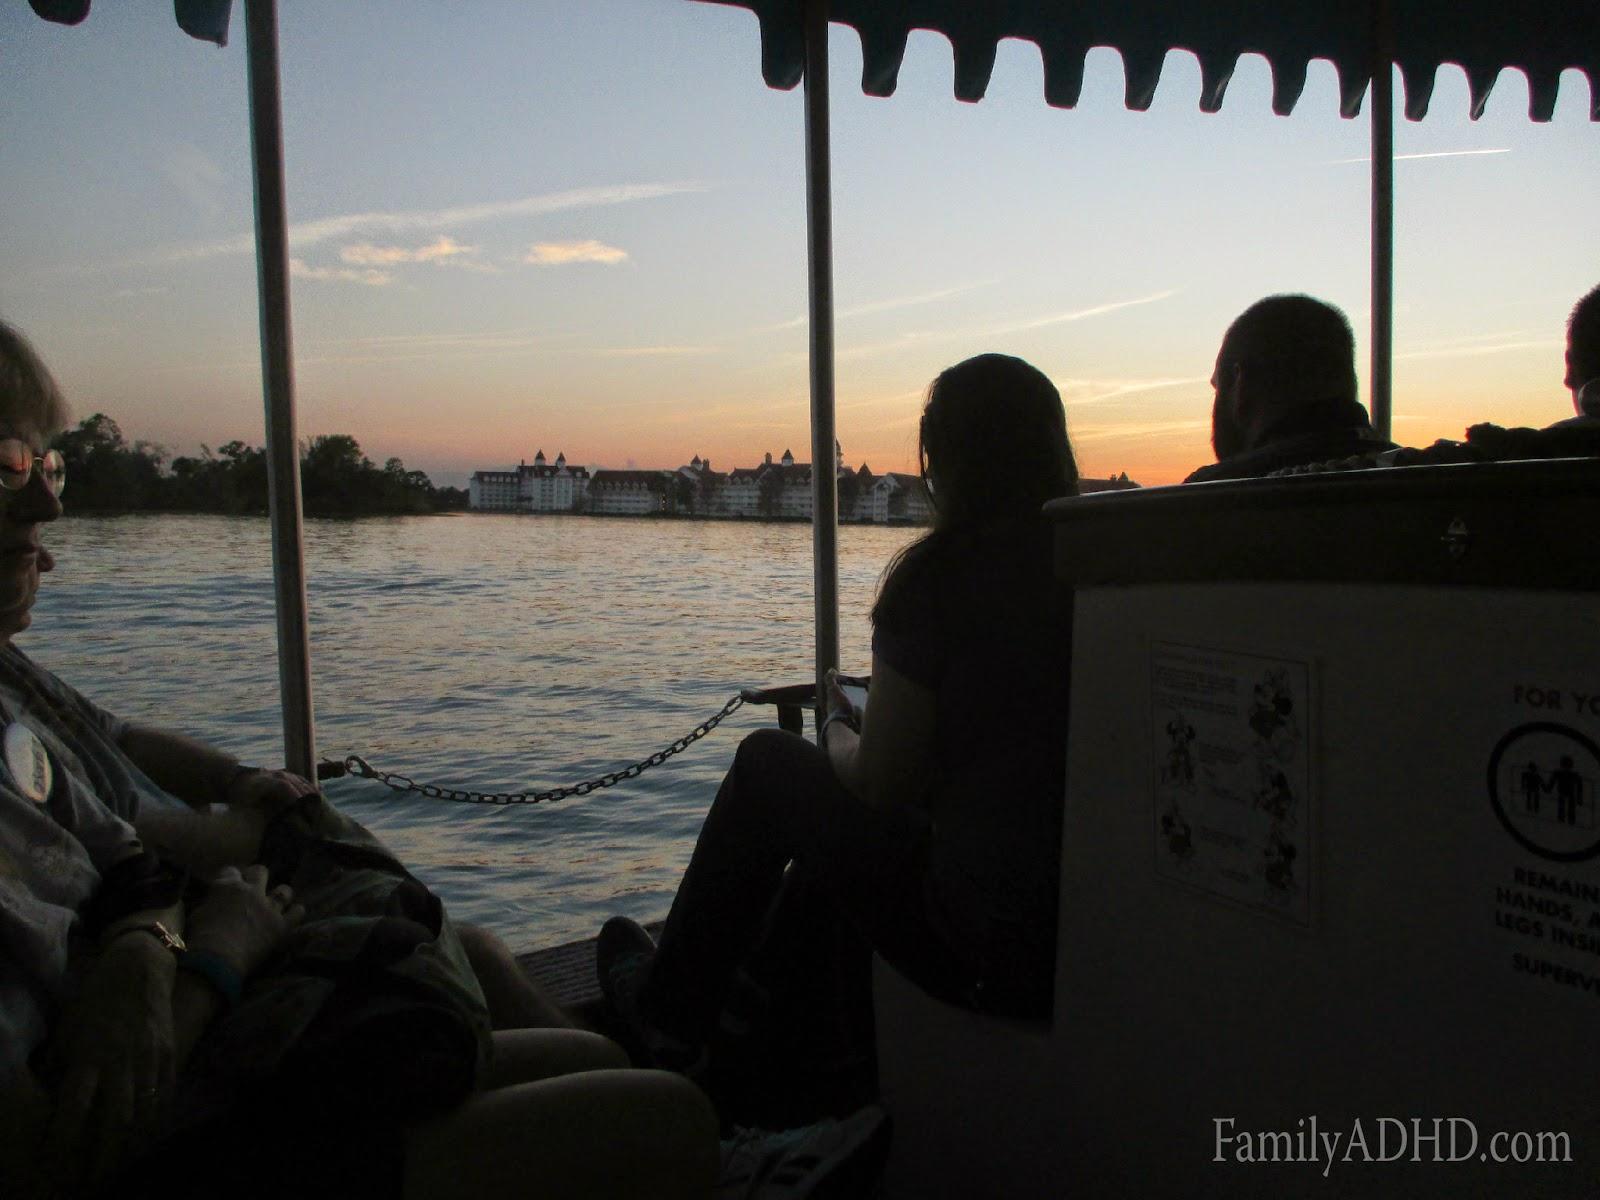 orlando family travel guide 2015 disney magic kingdom tips and review